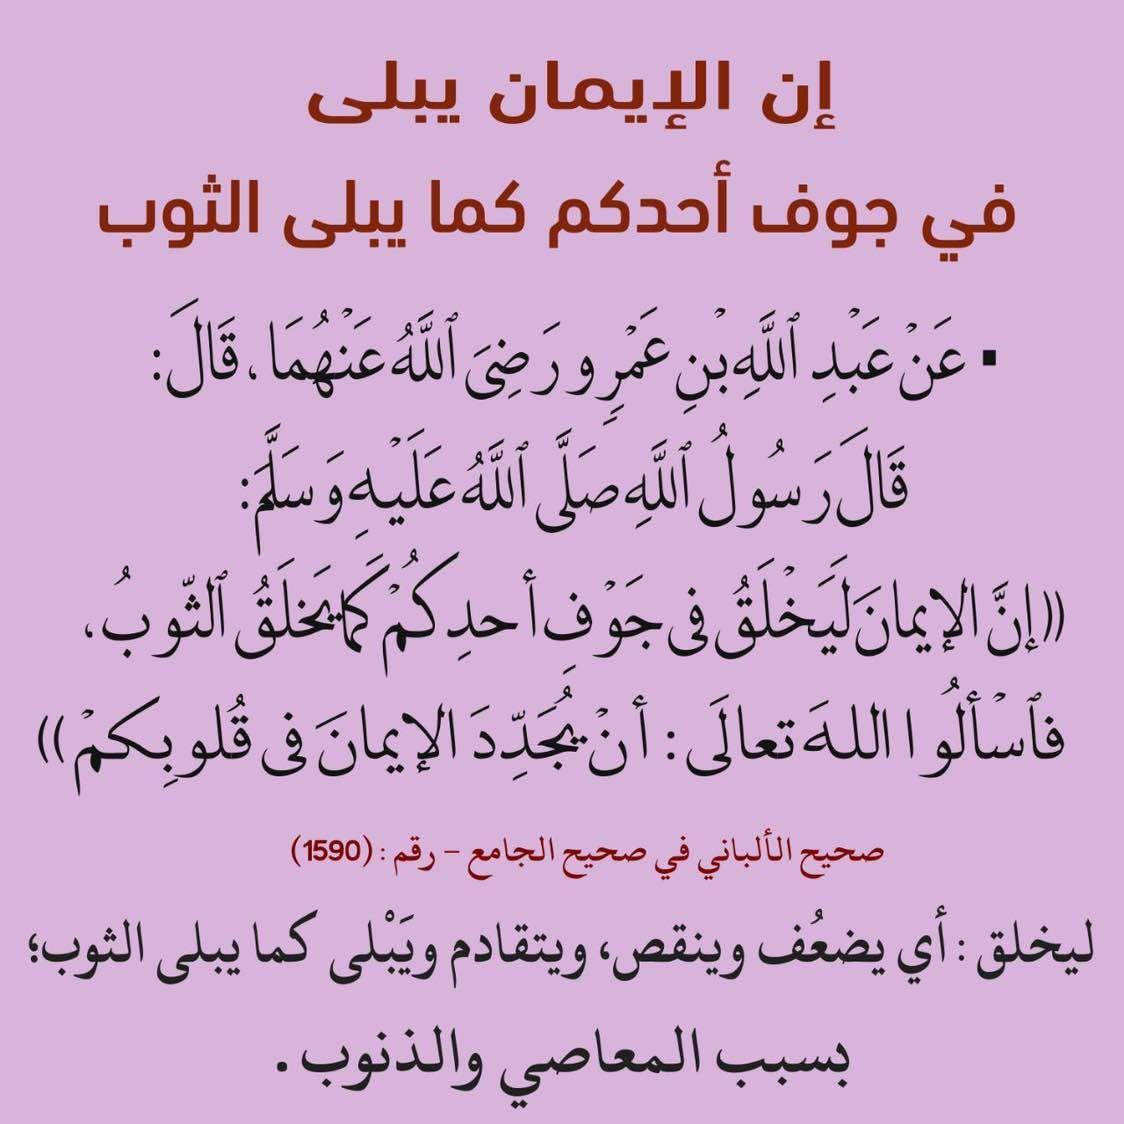 Pin By الأثر الجميل On أحاديث نبوية Ahadith Quotes Hadeeth